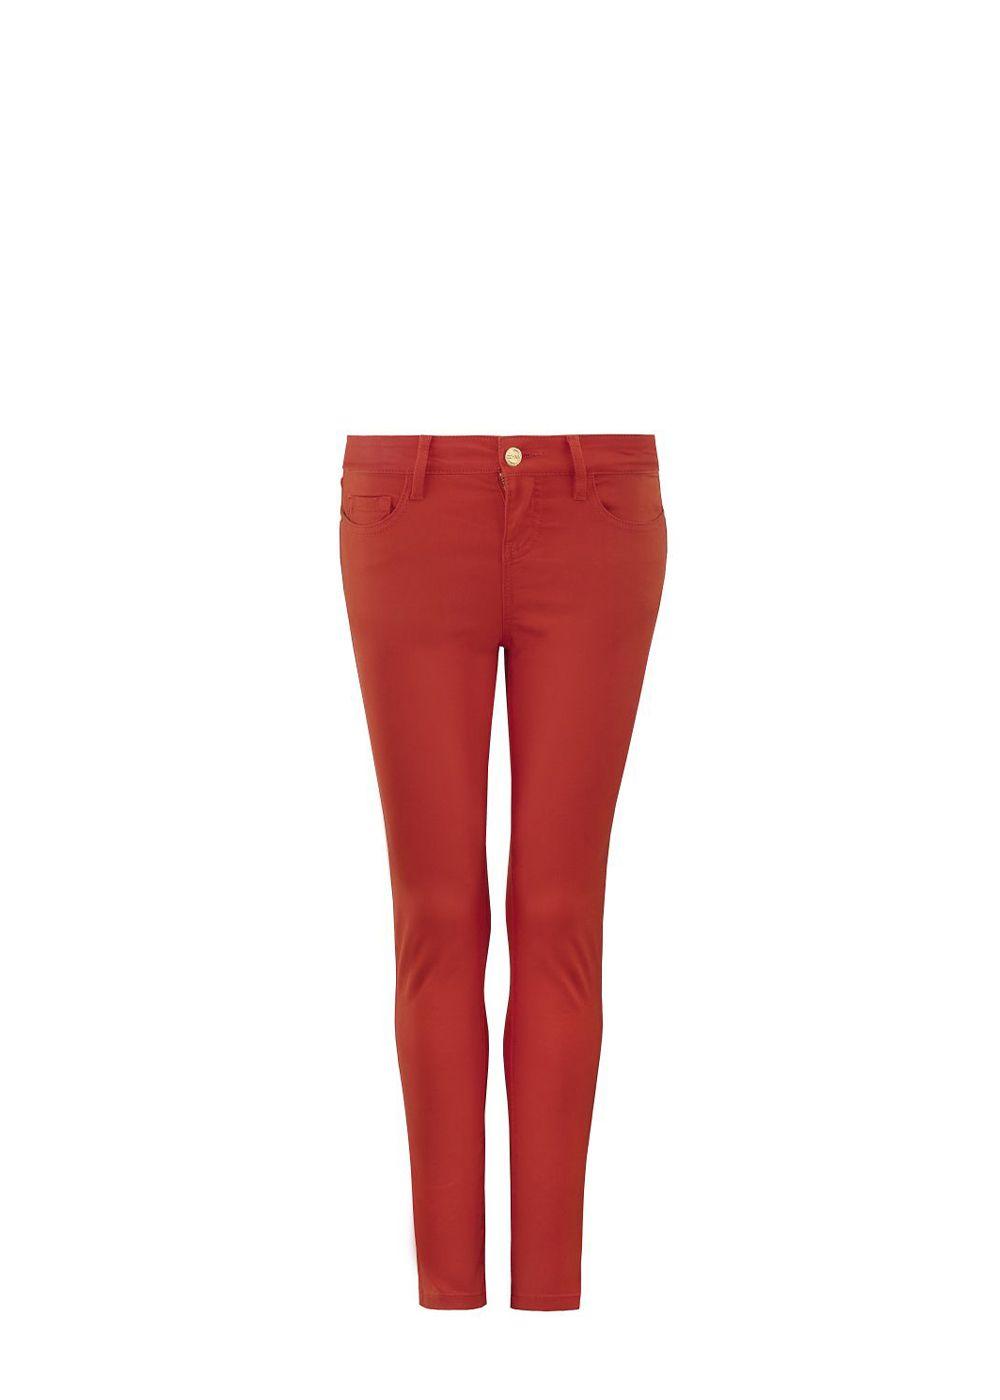 Spodnie damskie SPODT-0026-42(Z18)